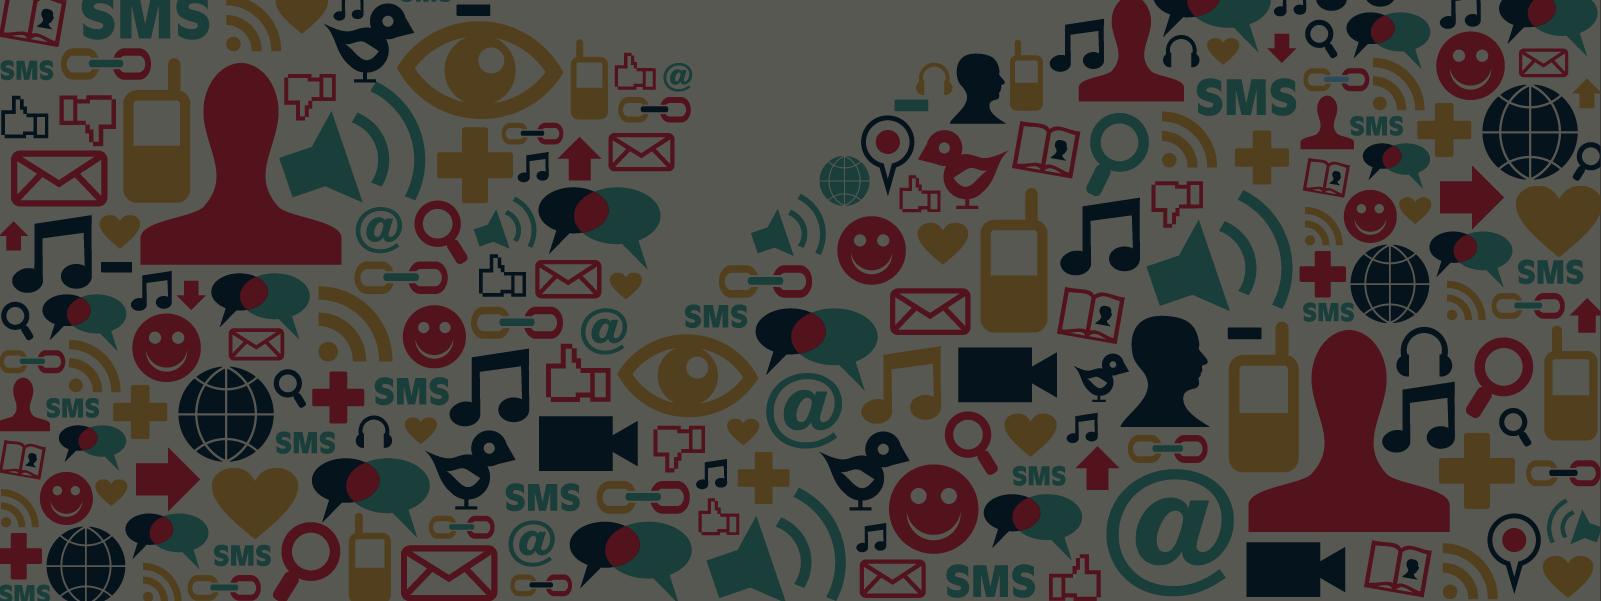 The best social media marketing blogs